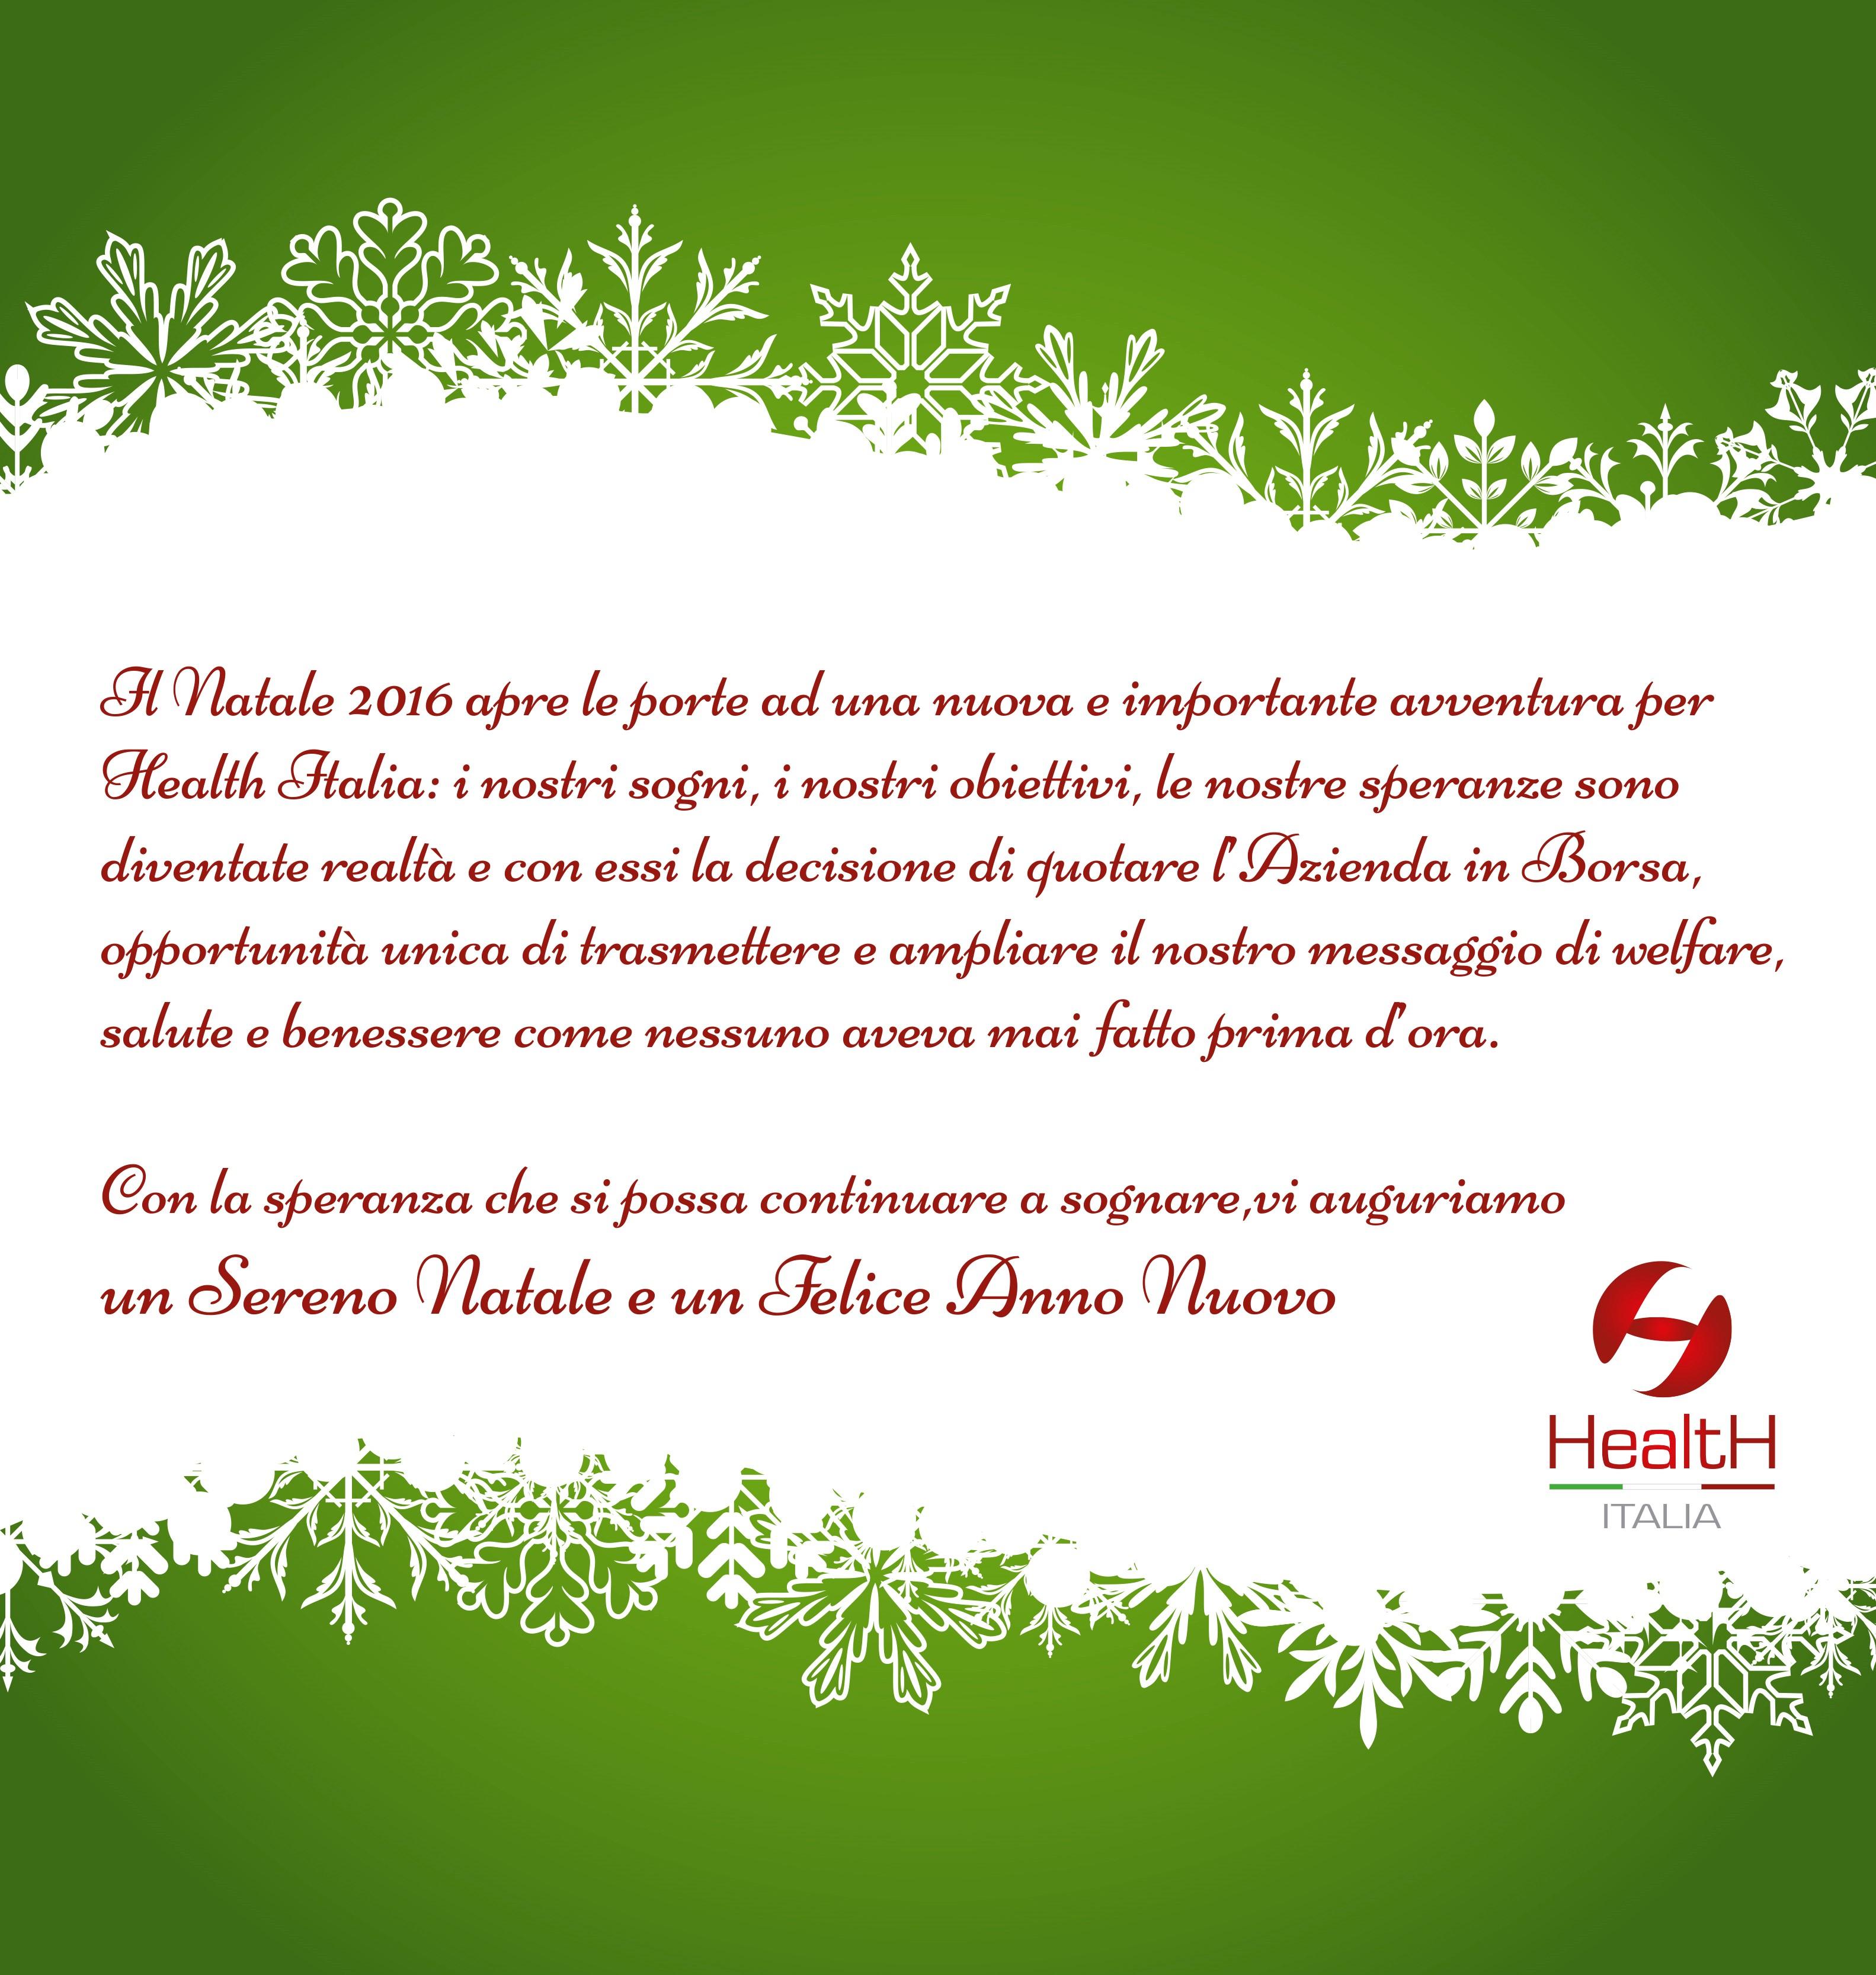 Buon Natale Italia.Buon Natale Healthitalia S P A